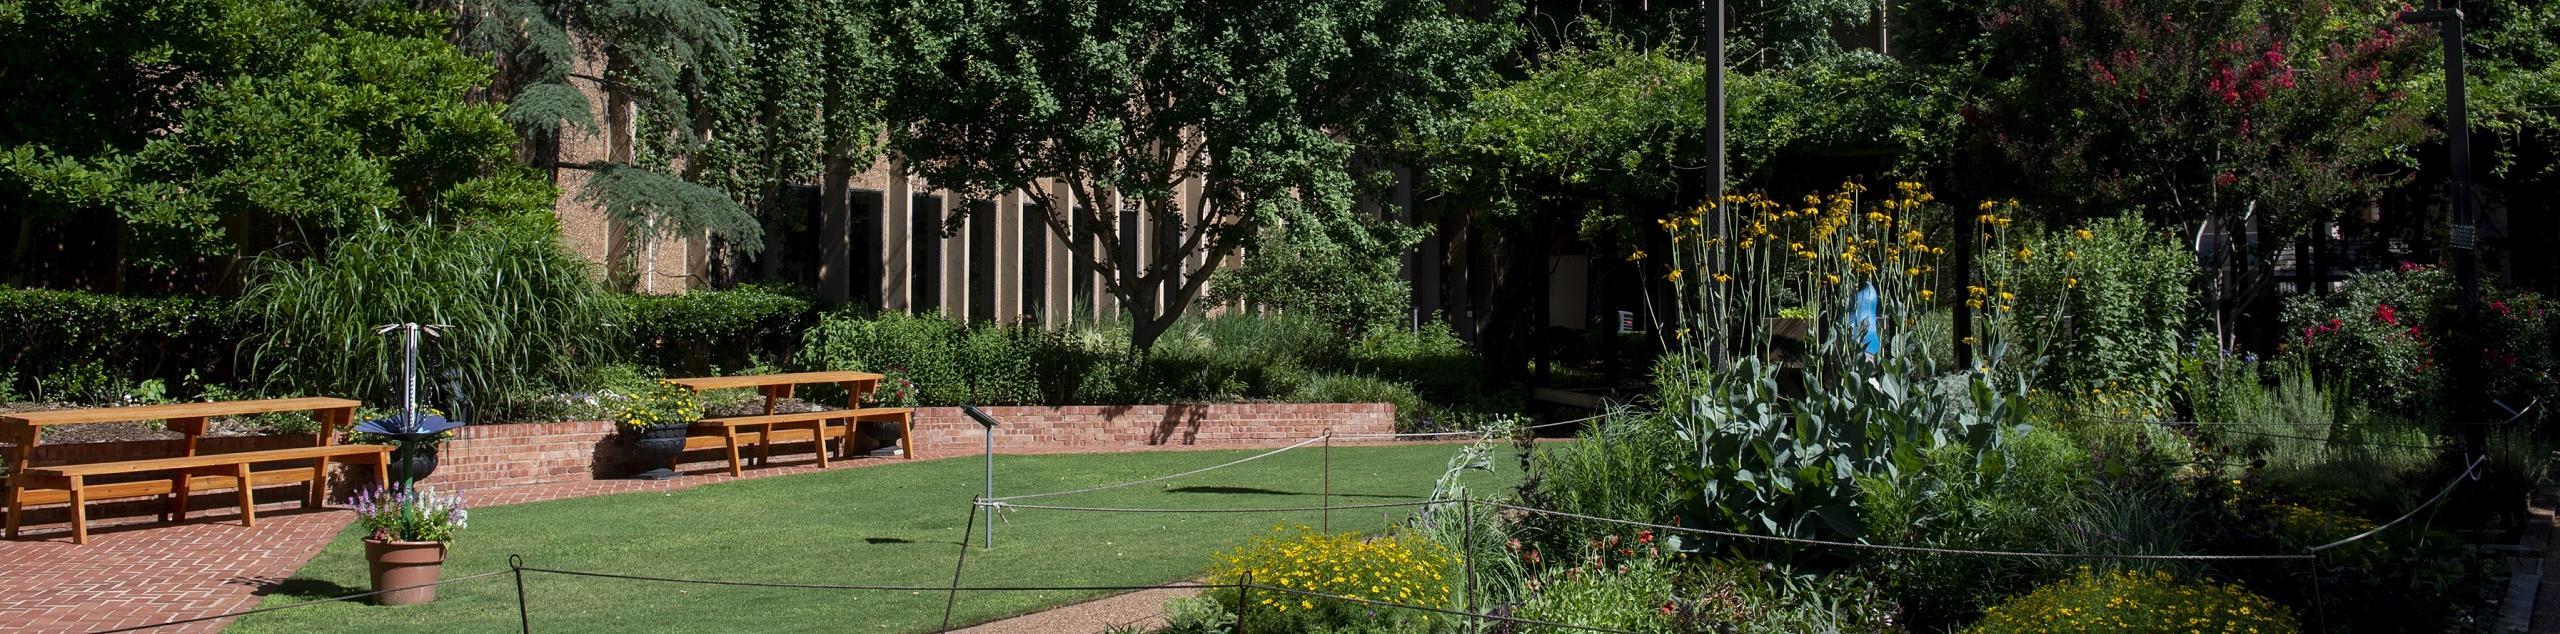 The Gardens at Science Museum Oklahoma